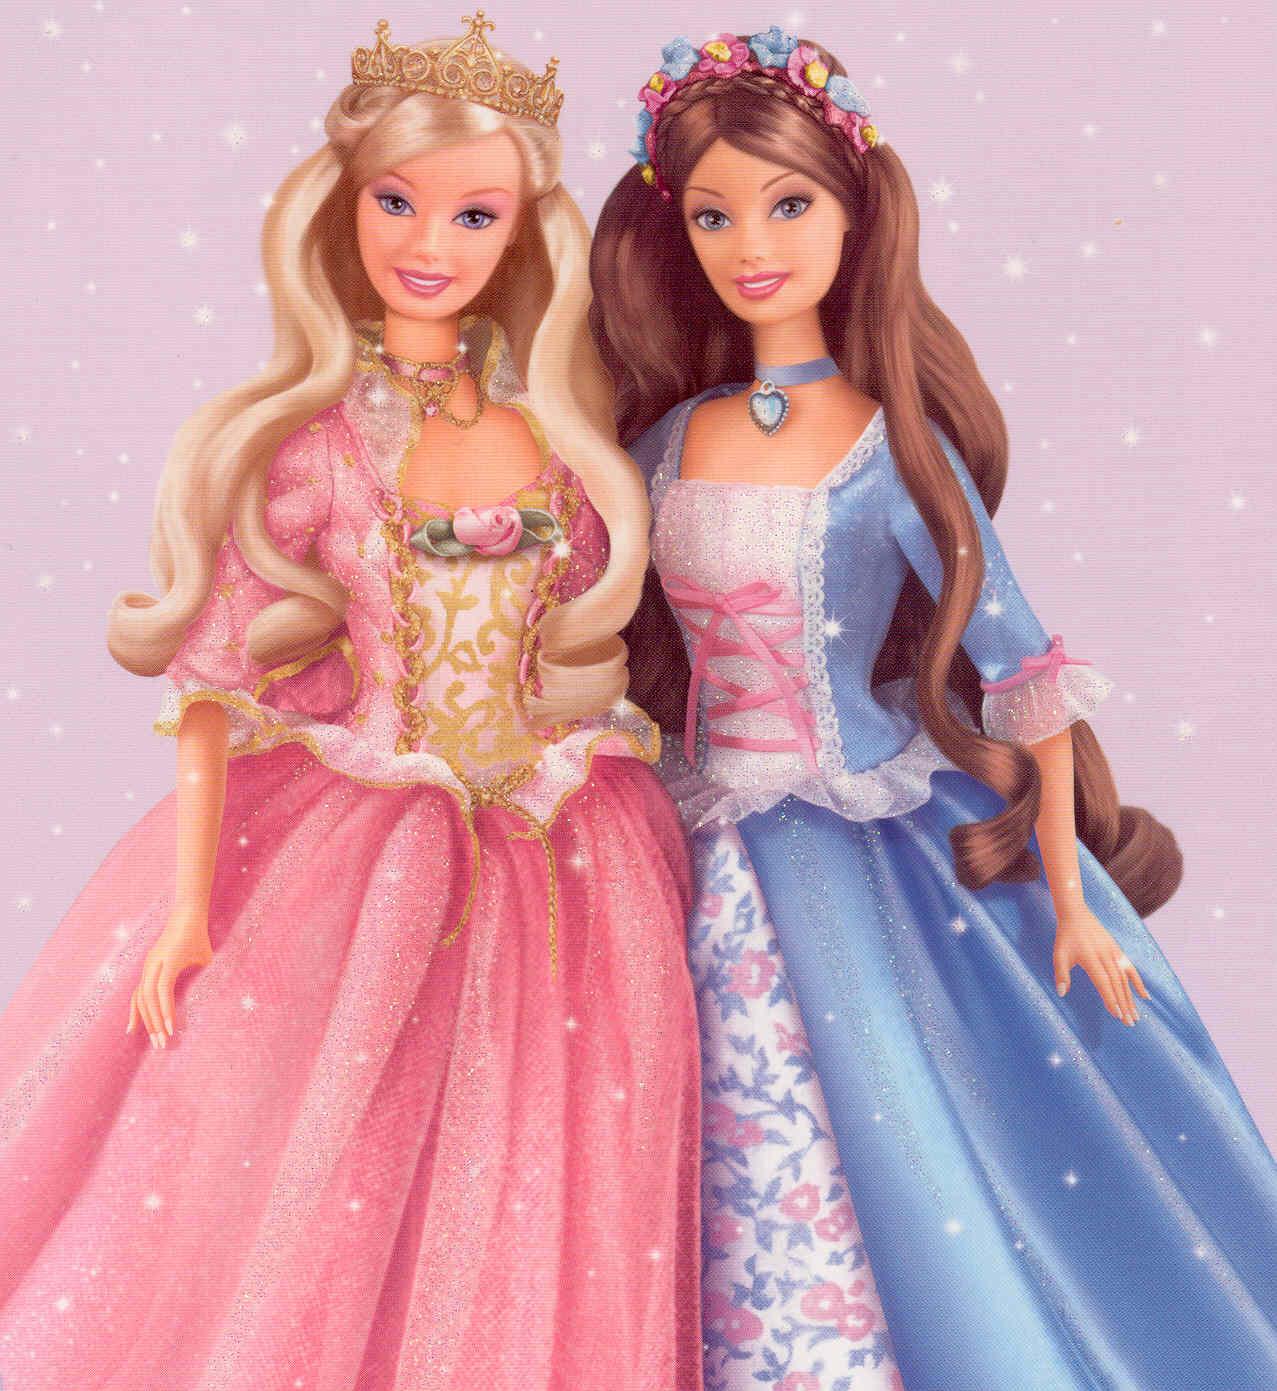 Gambar Gambar Barbie Cantik Dan Anggun Limited Edition Gambar Gambar Lucu Unik Bergerak